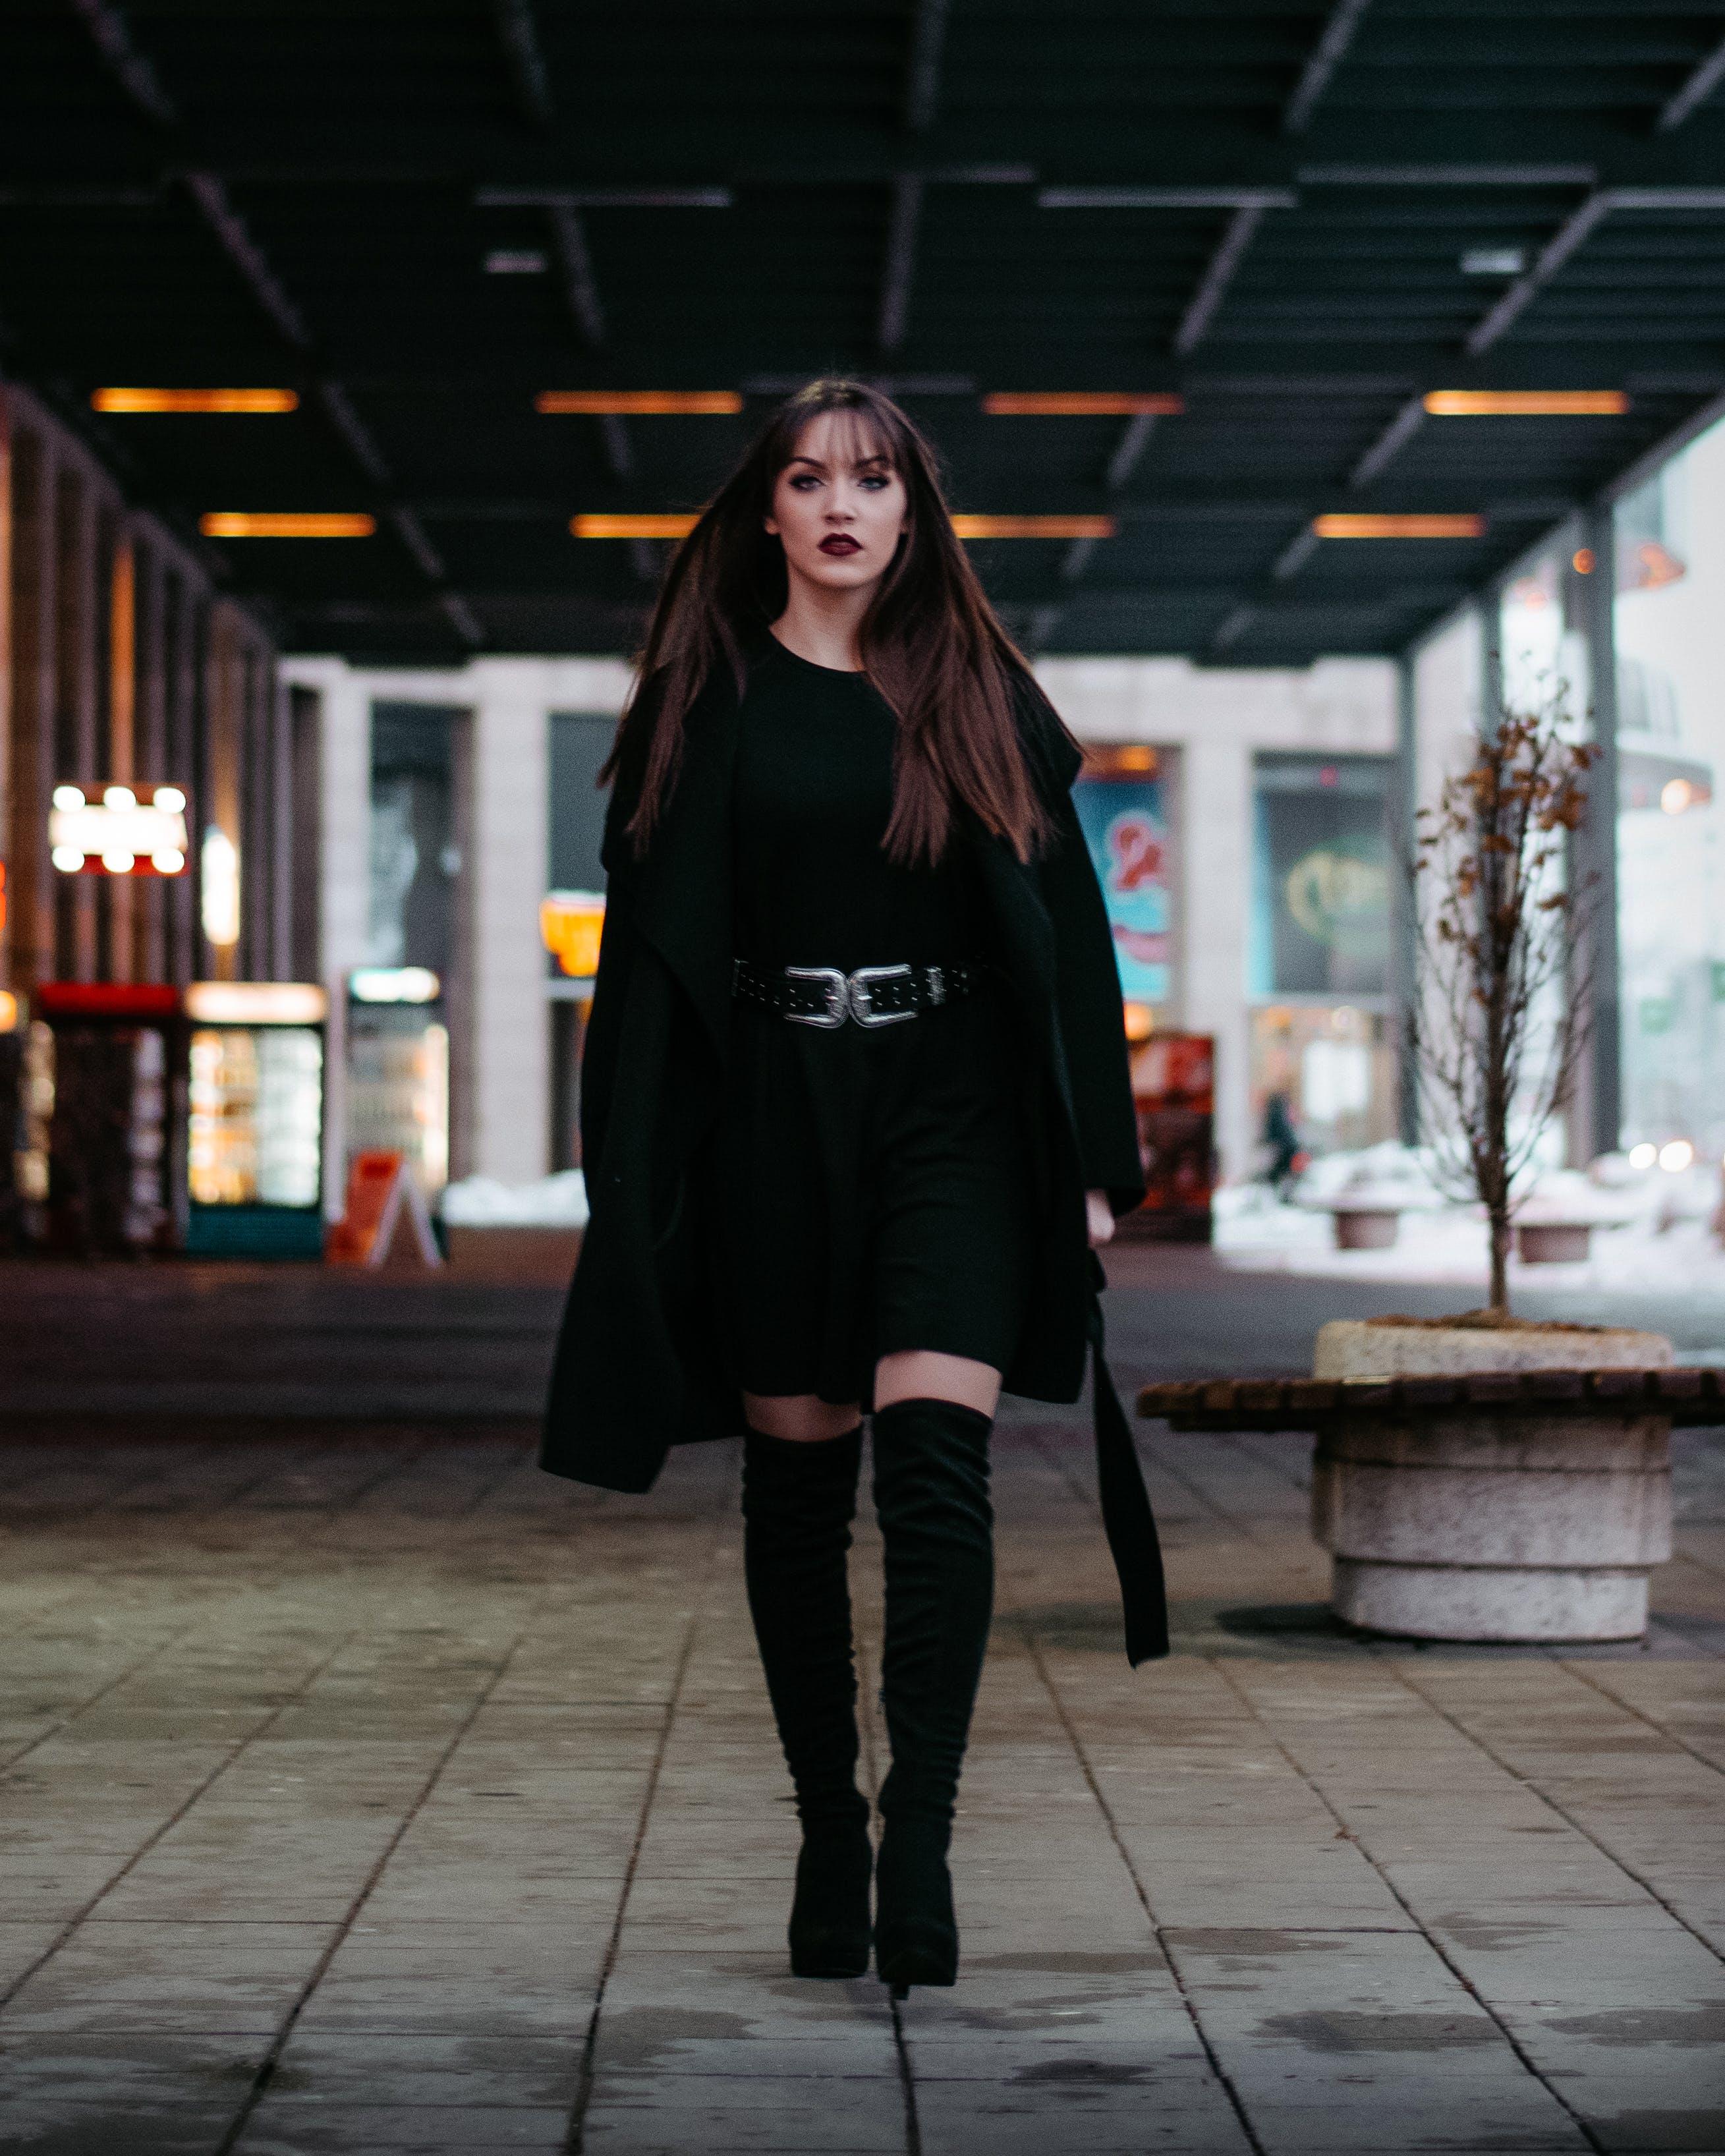 Woman Walking Alone on Pathway